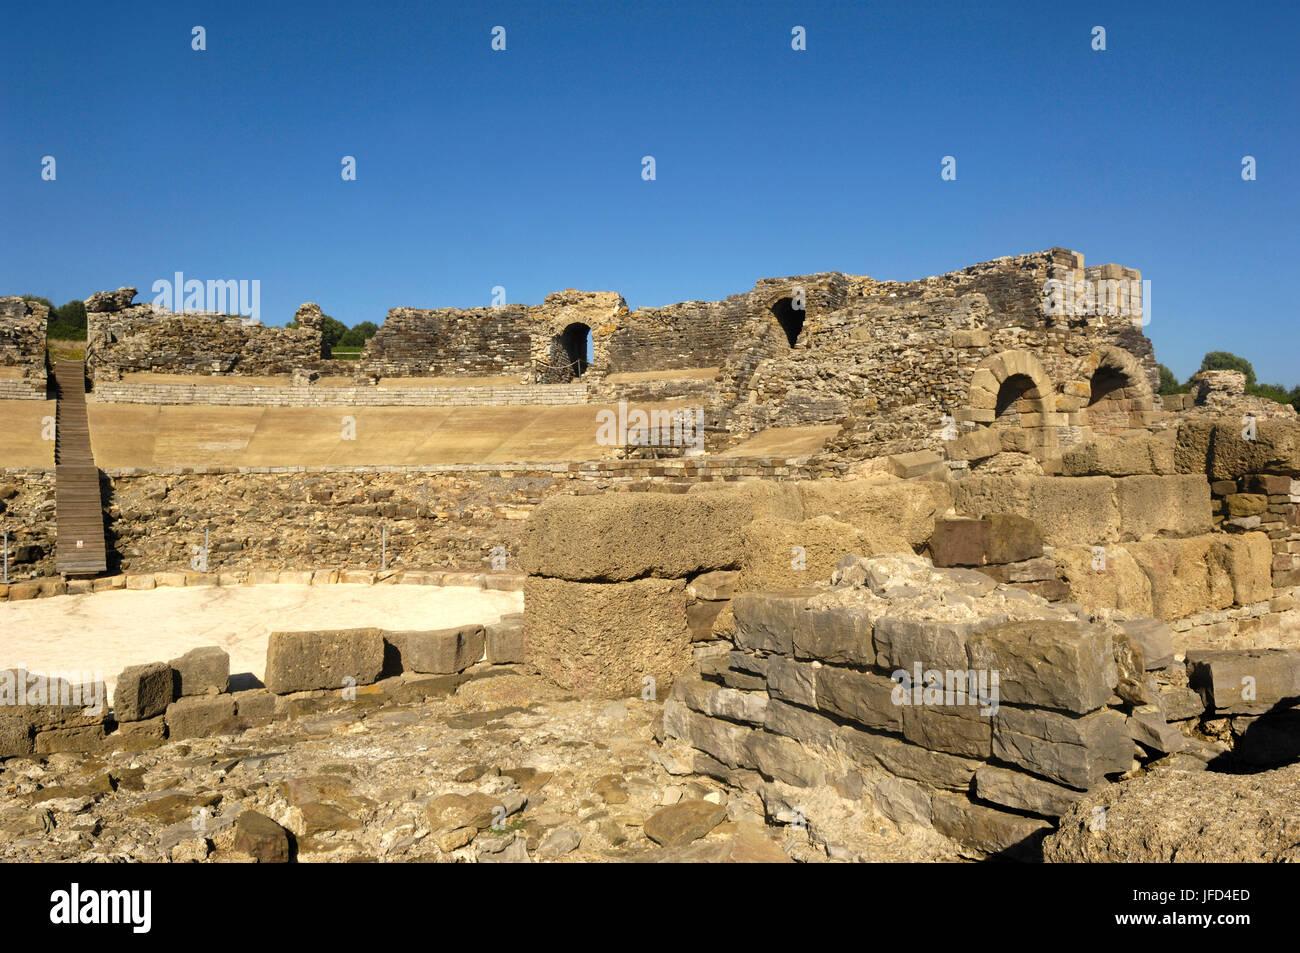 The Baelo Claudia ancient Roman town located in Bolonia, Cadiz province, Spain Stock Photo